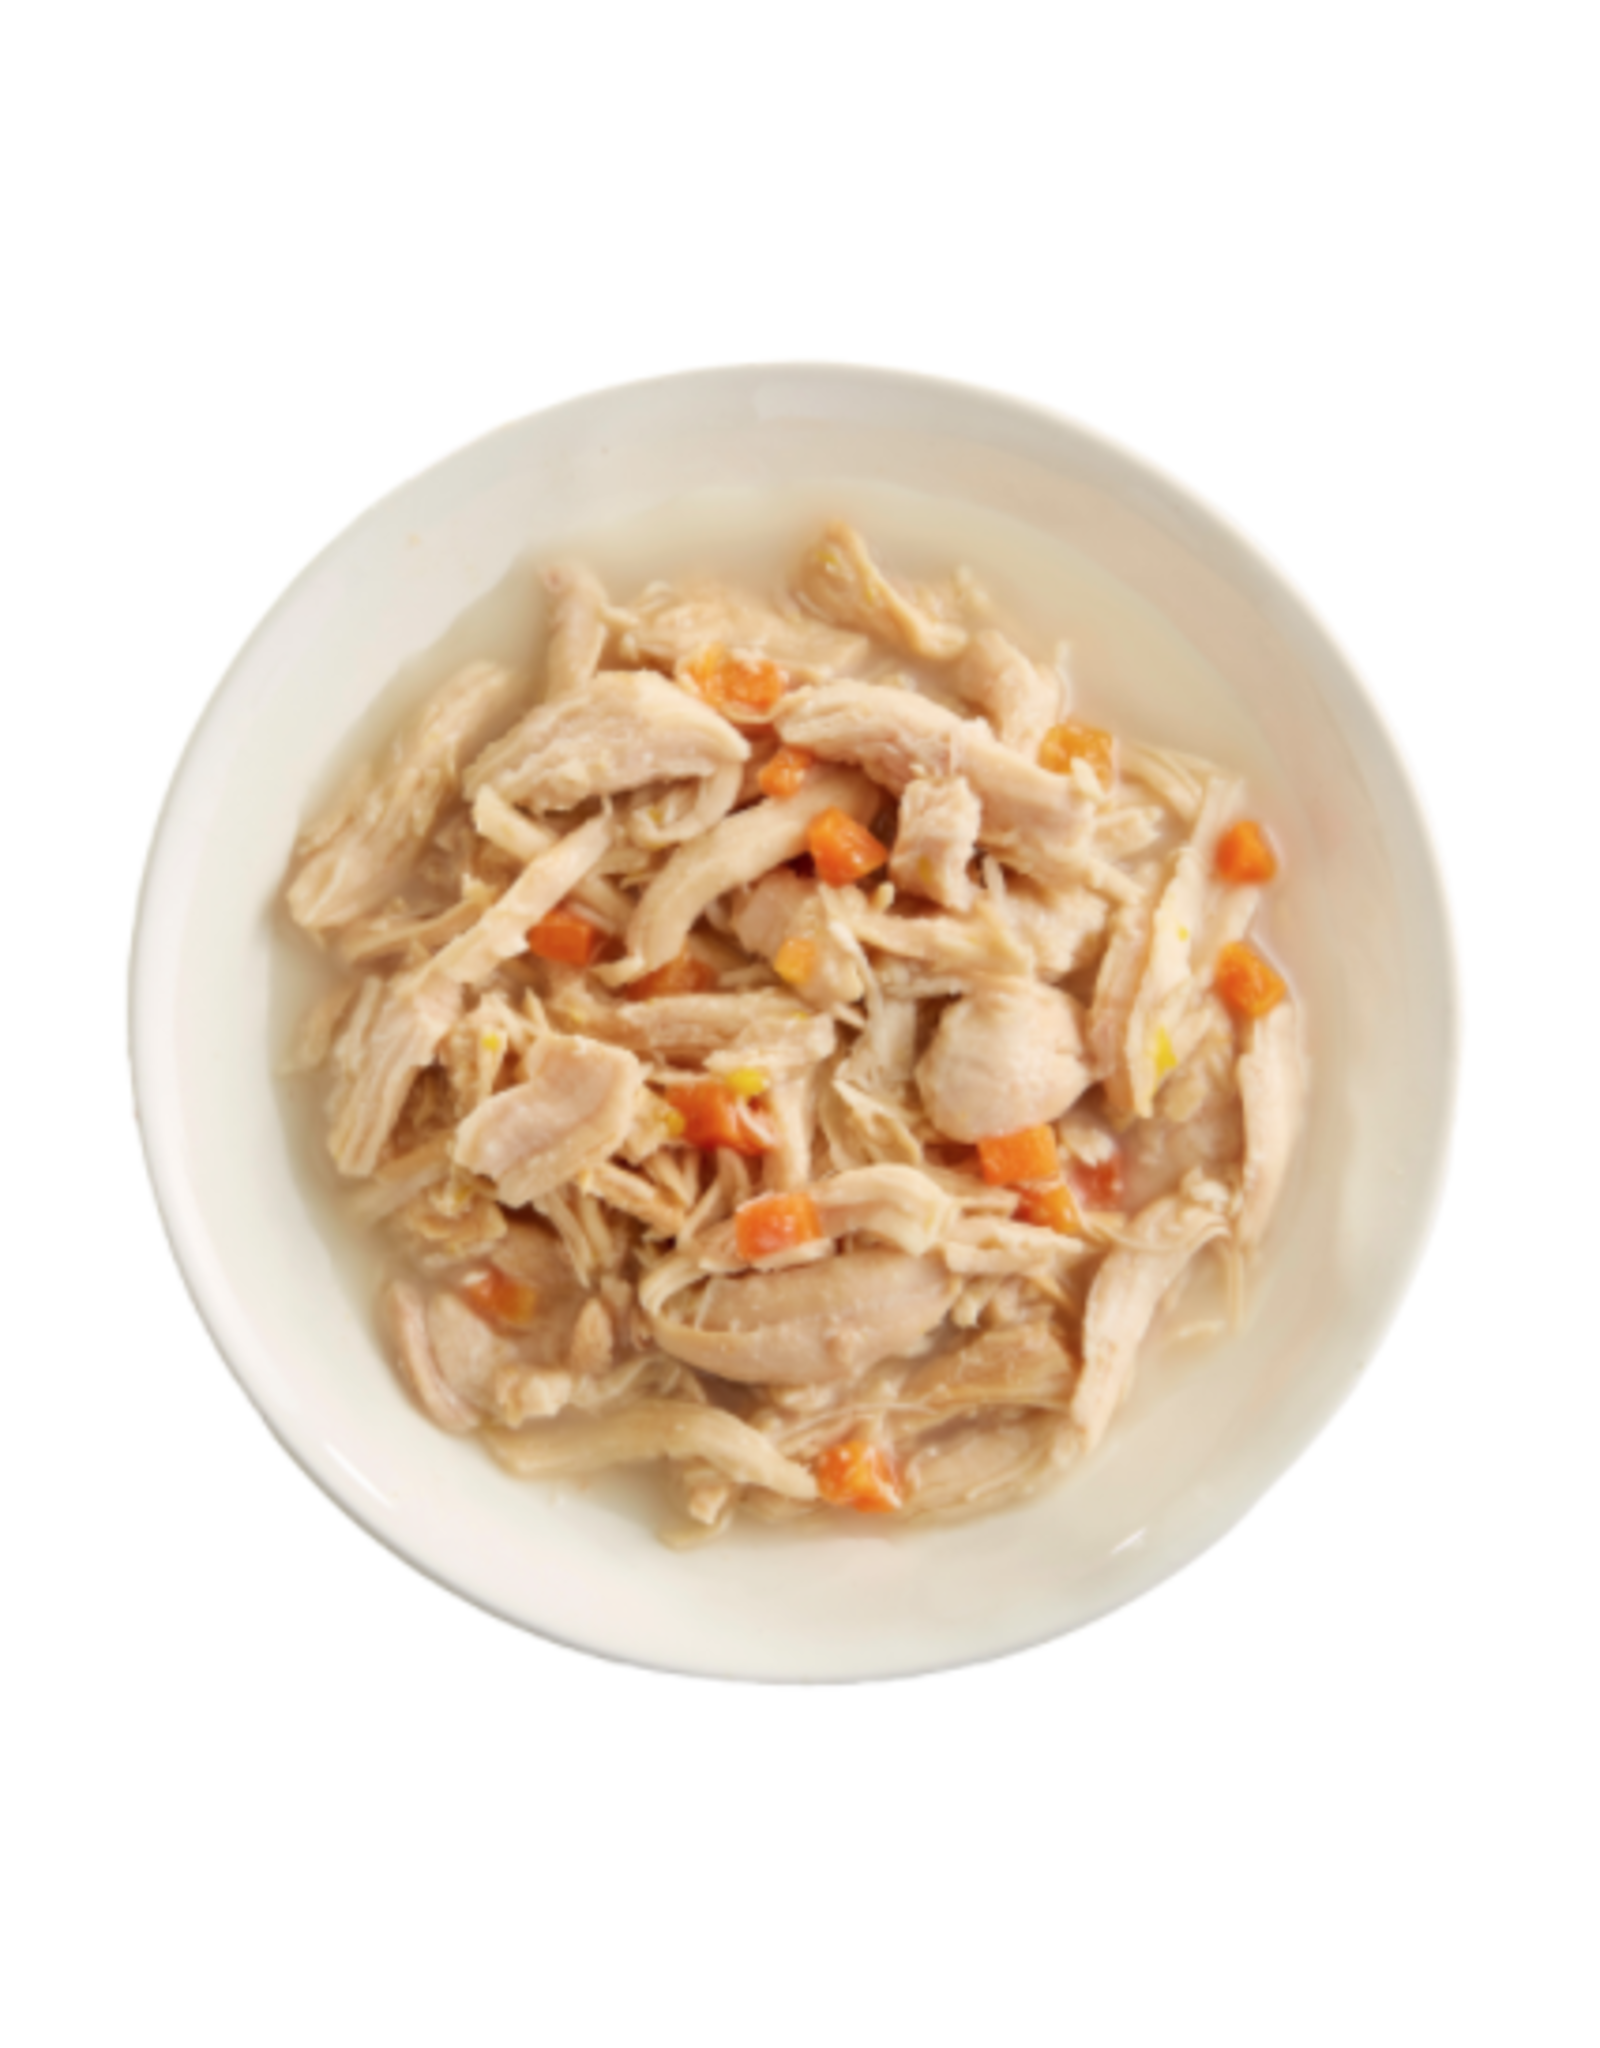 Rawz Rawz Shredded Chicken Breast, Pumpkin & New Zealand Green Mussels Recipe Dog Food 14oz